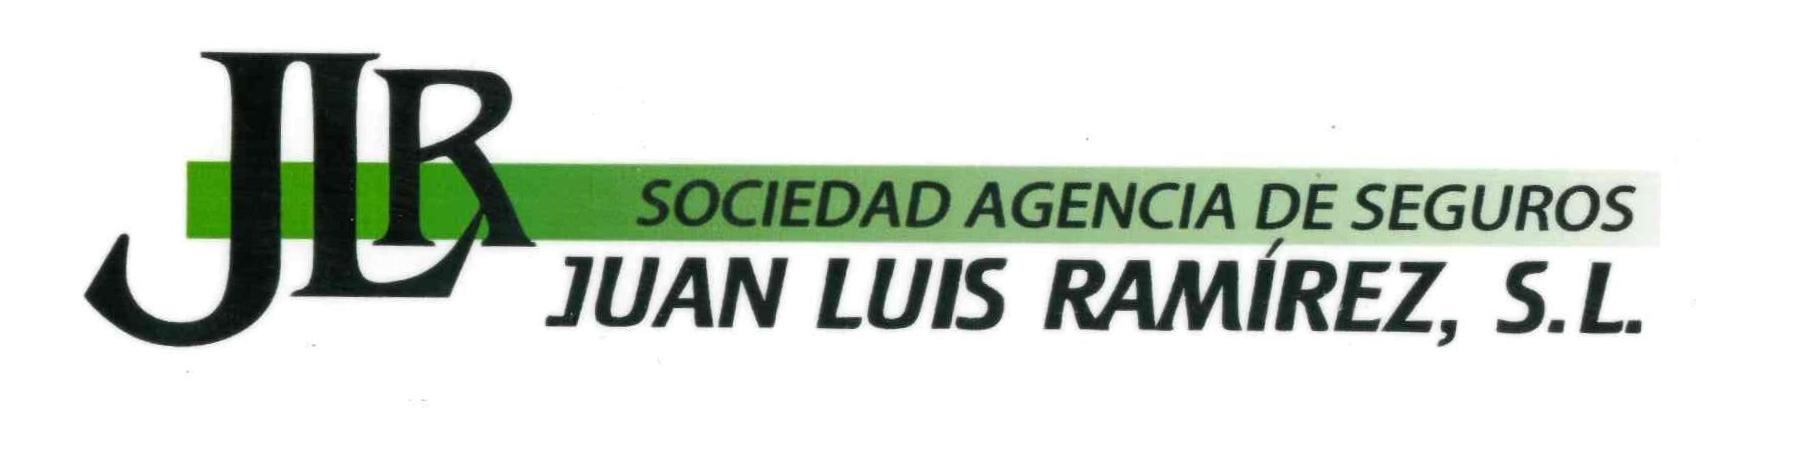 Juan Luis Ramirez S.L.